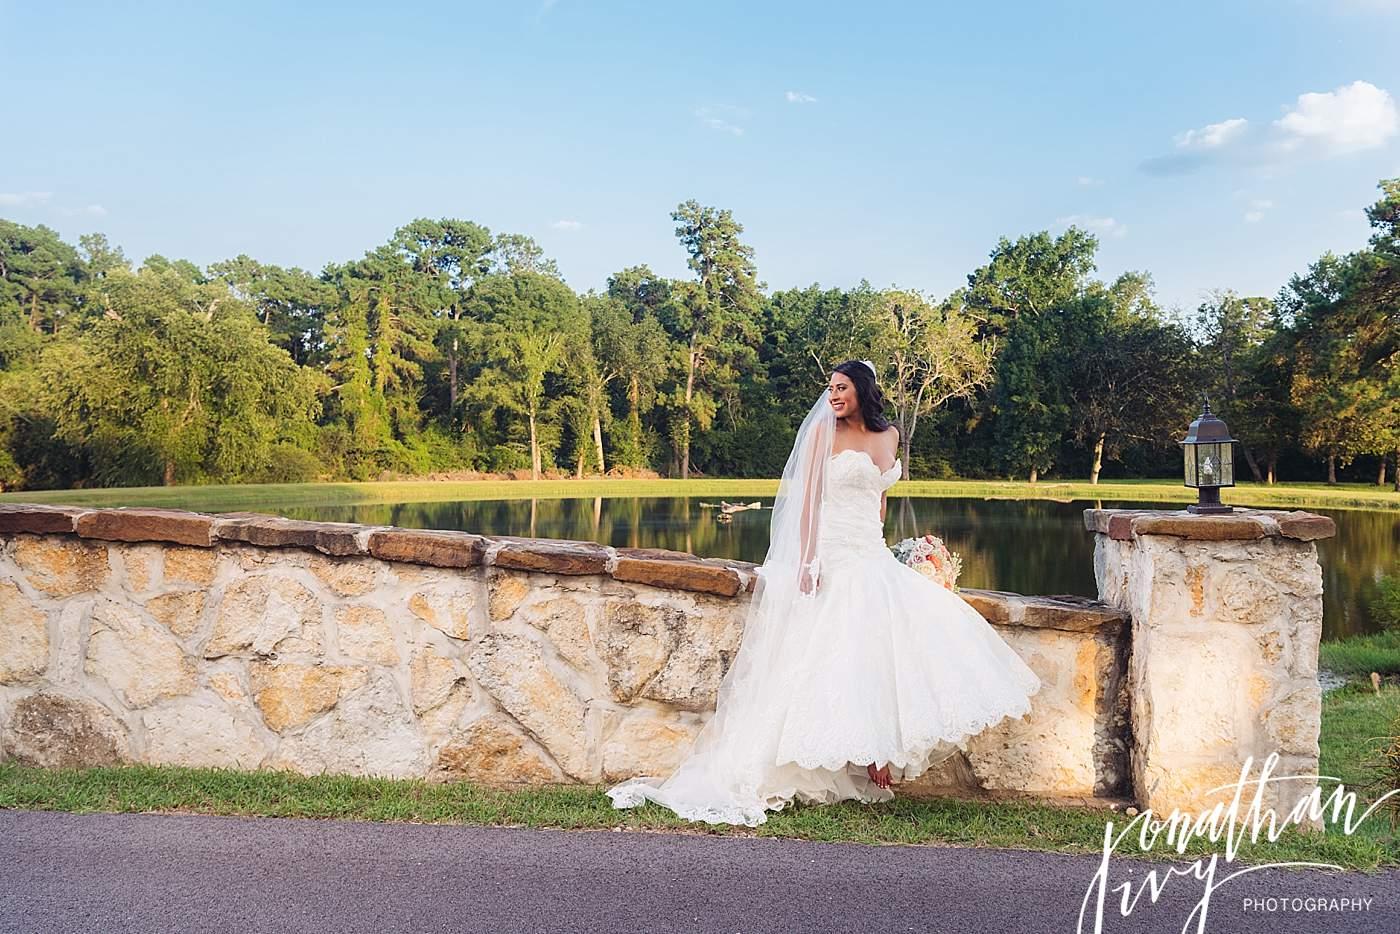 Balmorhea Bridal,Balmorhea Events,Balmorhea Events Bridal,Bridal at Balmorhea,Houston Wedding Photographer,The Woodlands Wedding Photographer,